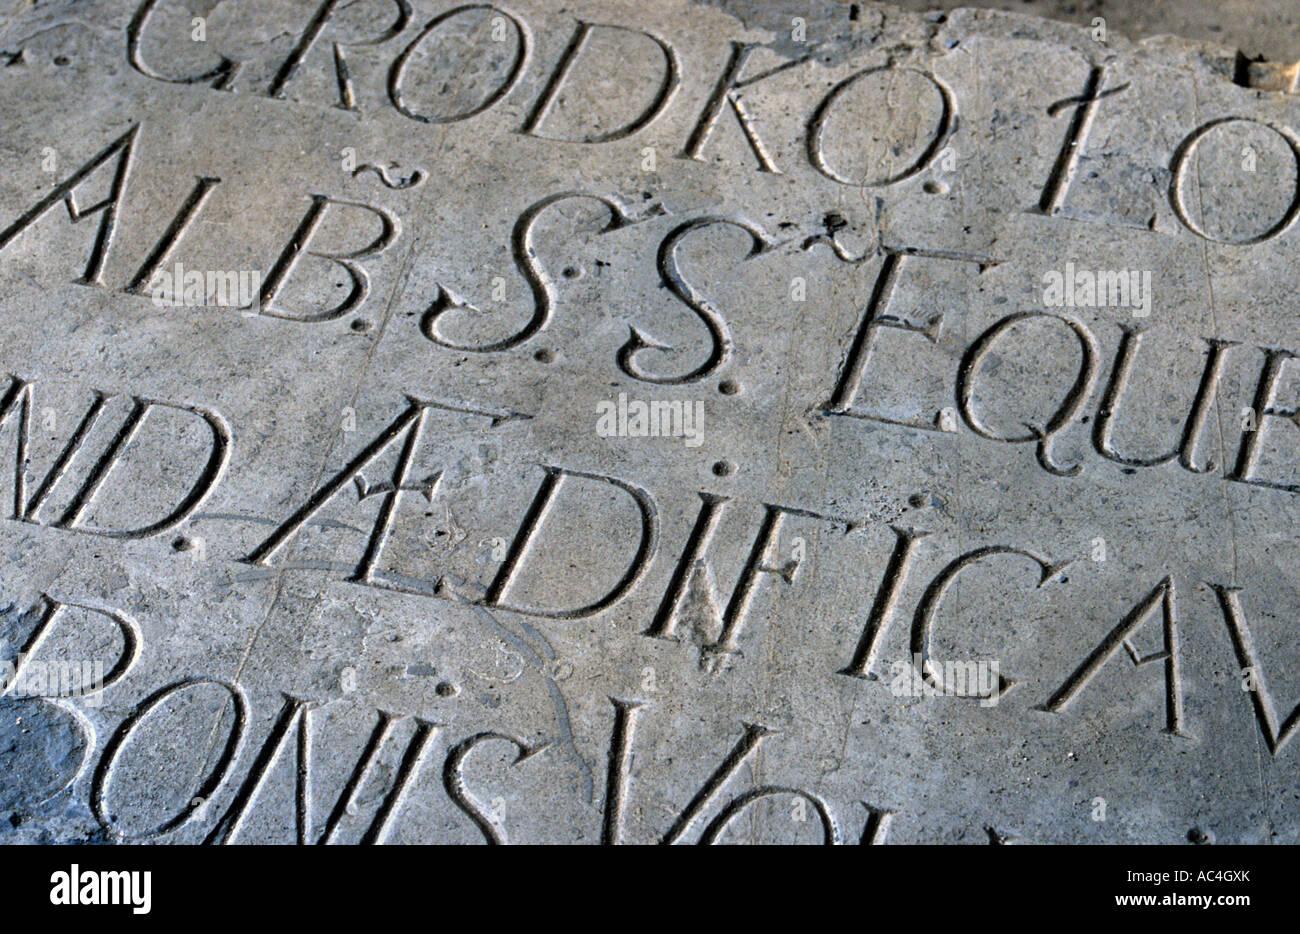 Old inscription on stone - Stock Image